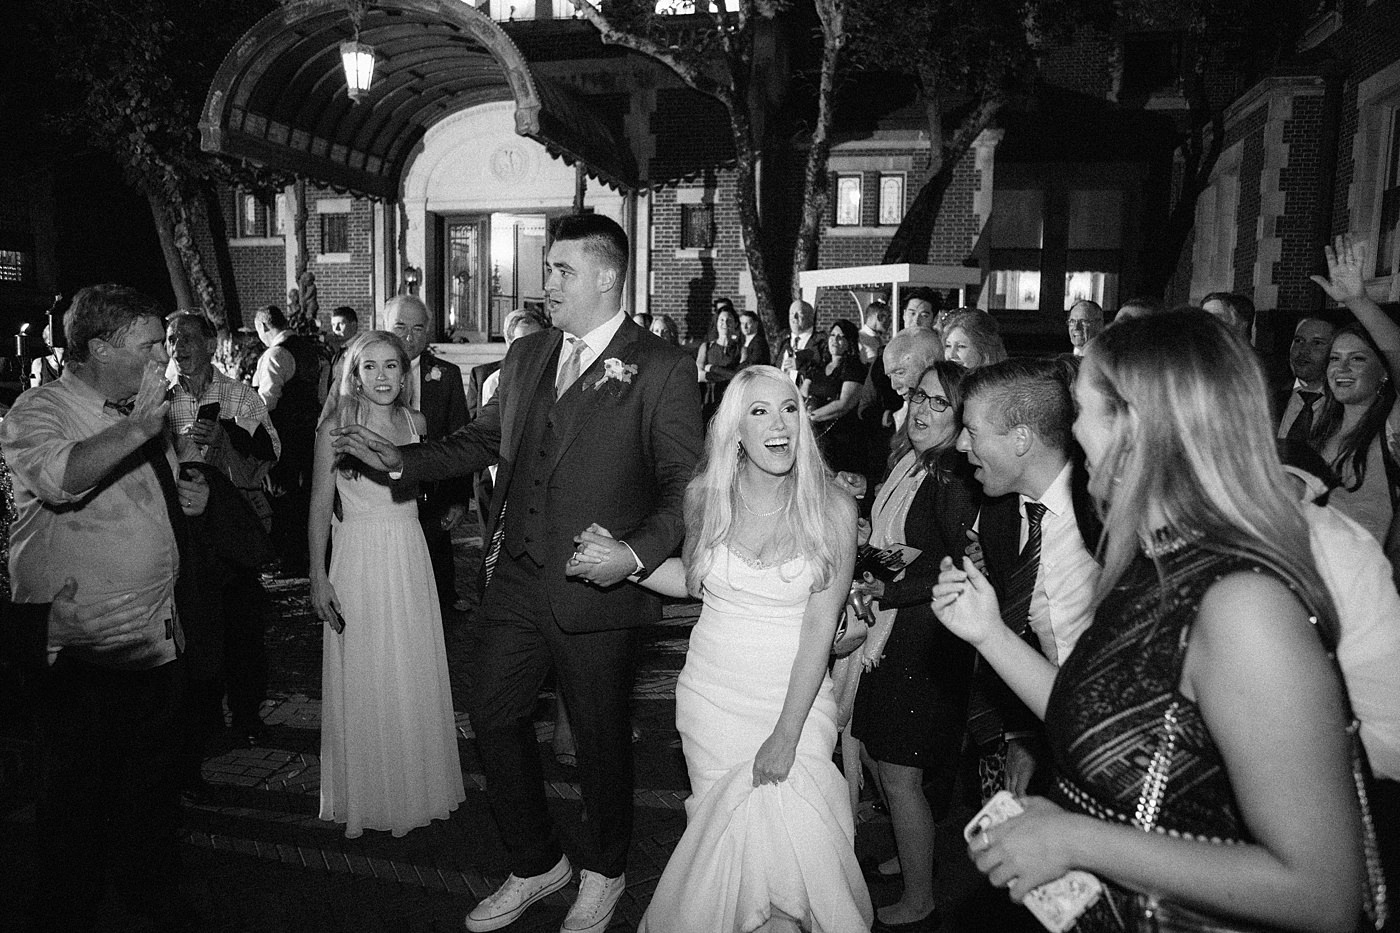 wedding grand exit